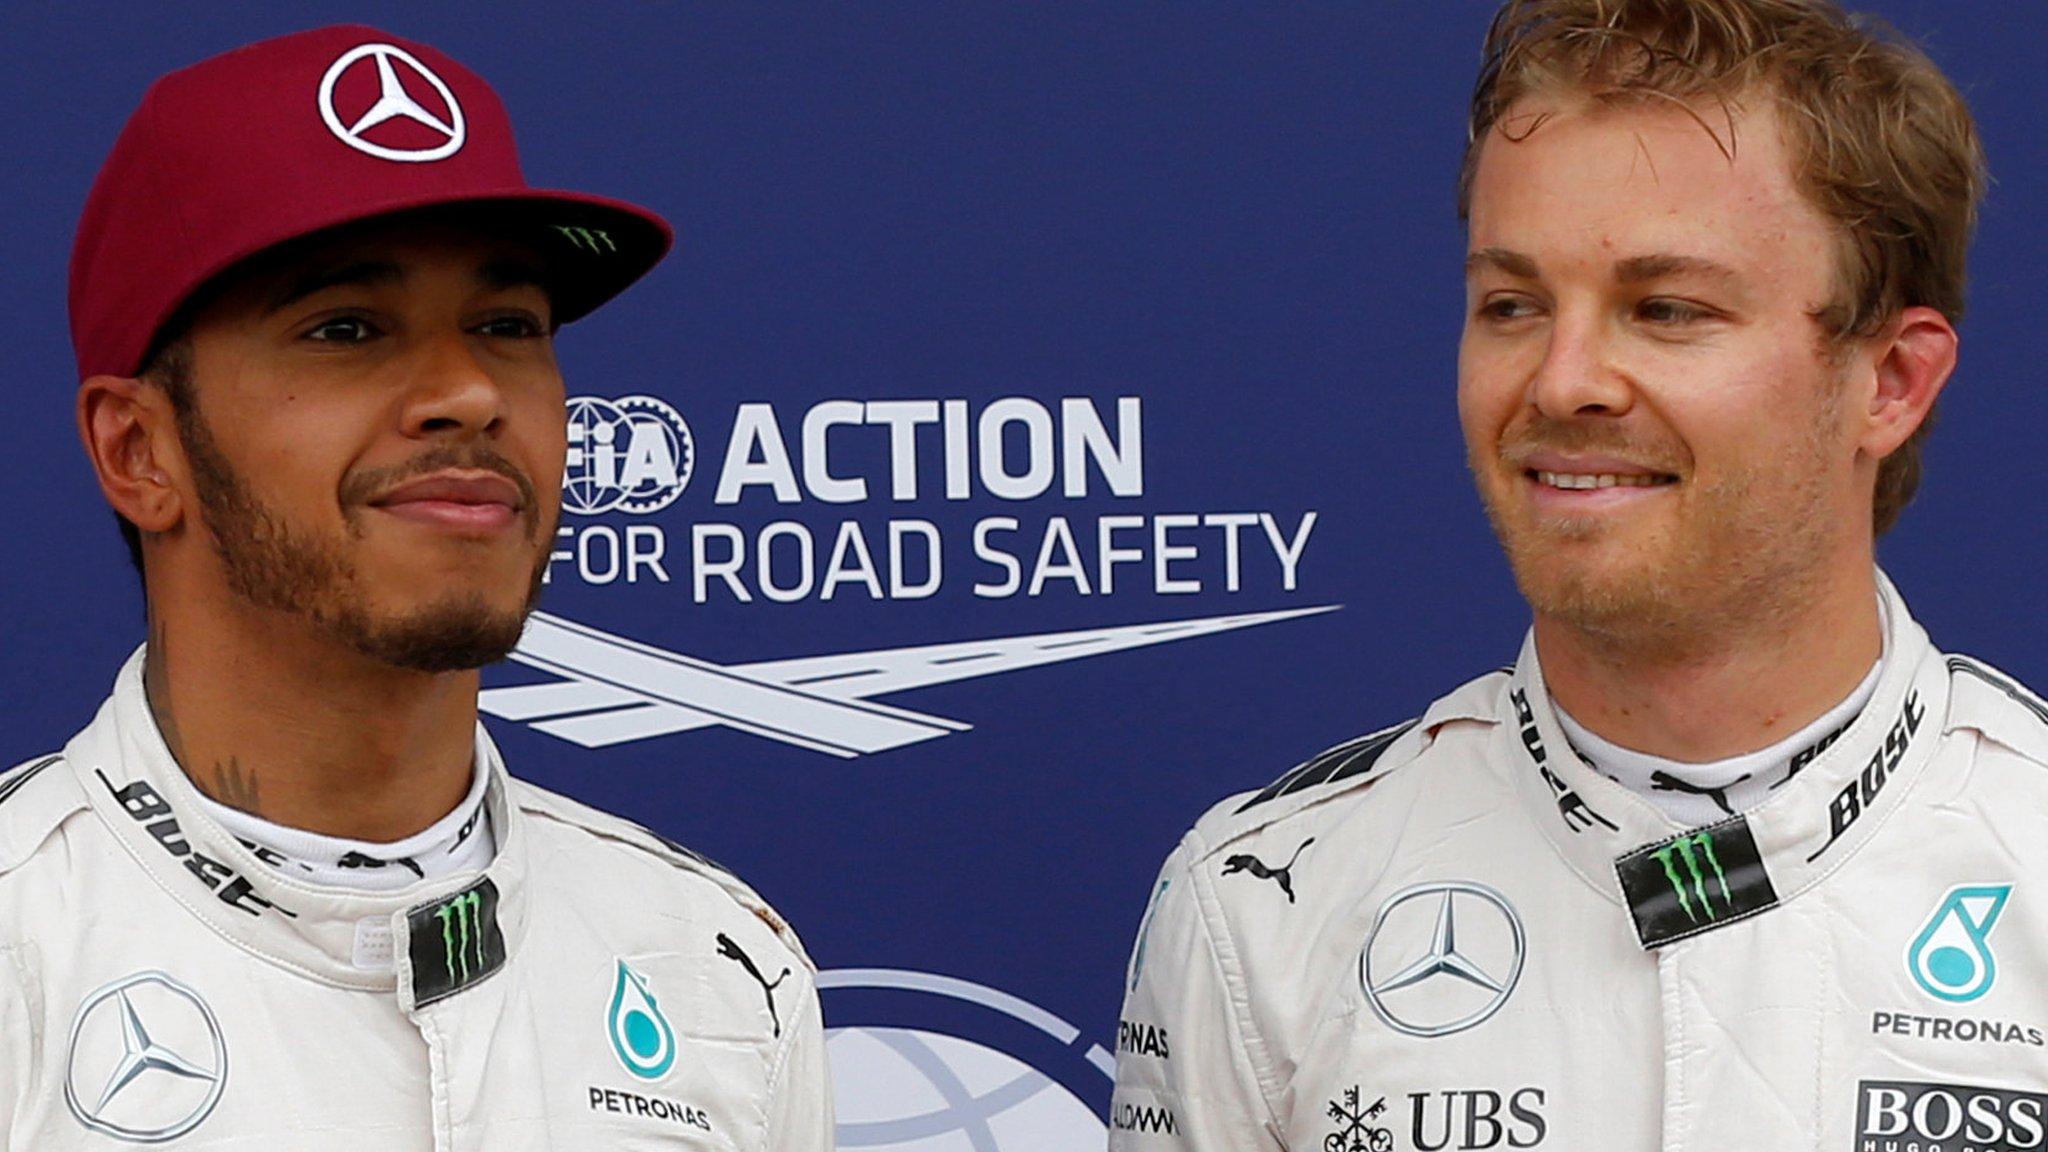 Usas scoreless draw vs serbia offers glimpse into arenas preferences foxsports com - British Gp Lewis Hamilton Nico Rosberg Threatened With Punishments By Mercedes